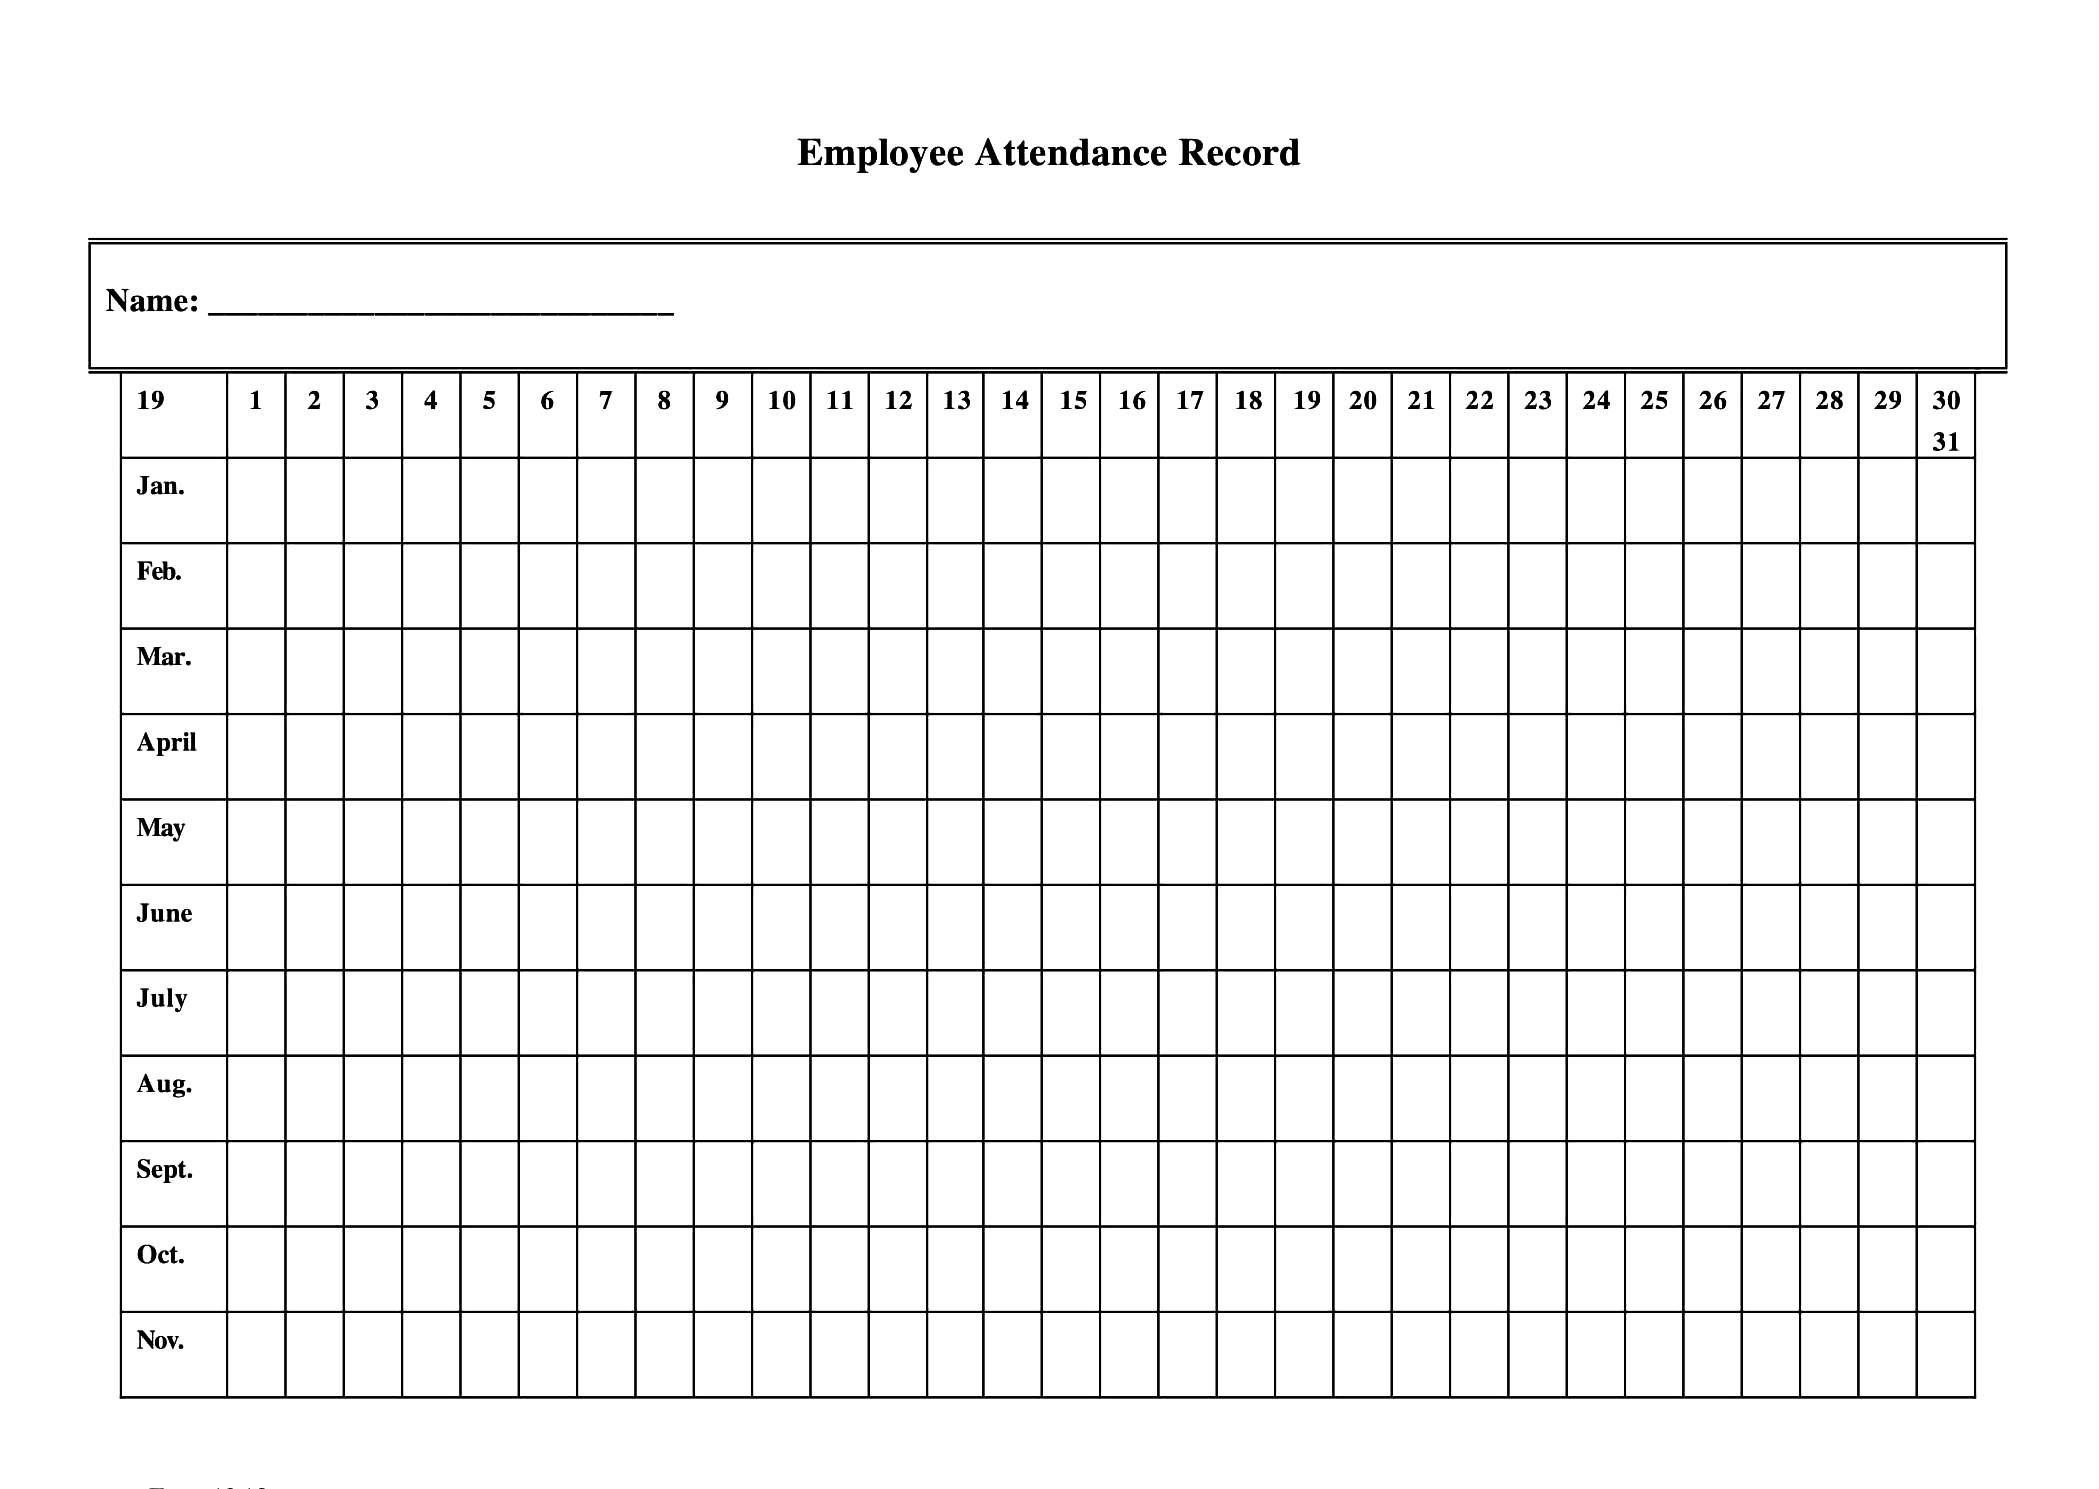 Free Printable Employee Attendance Sheet Pdf, Word, Excel  Free Printable 2020 Employee Attendance Sheet